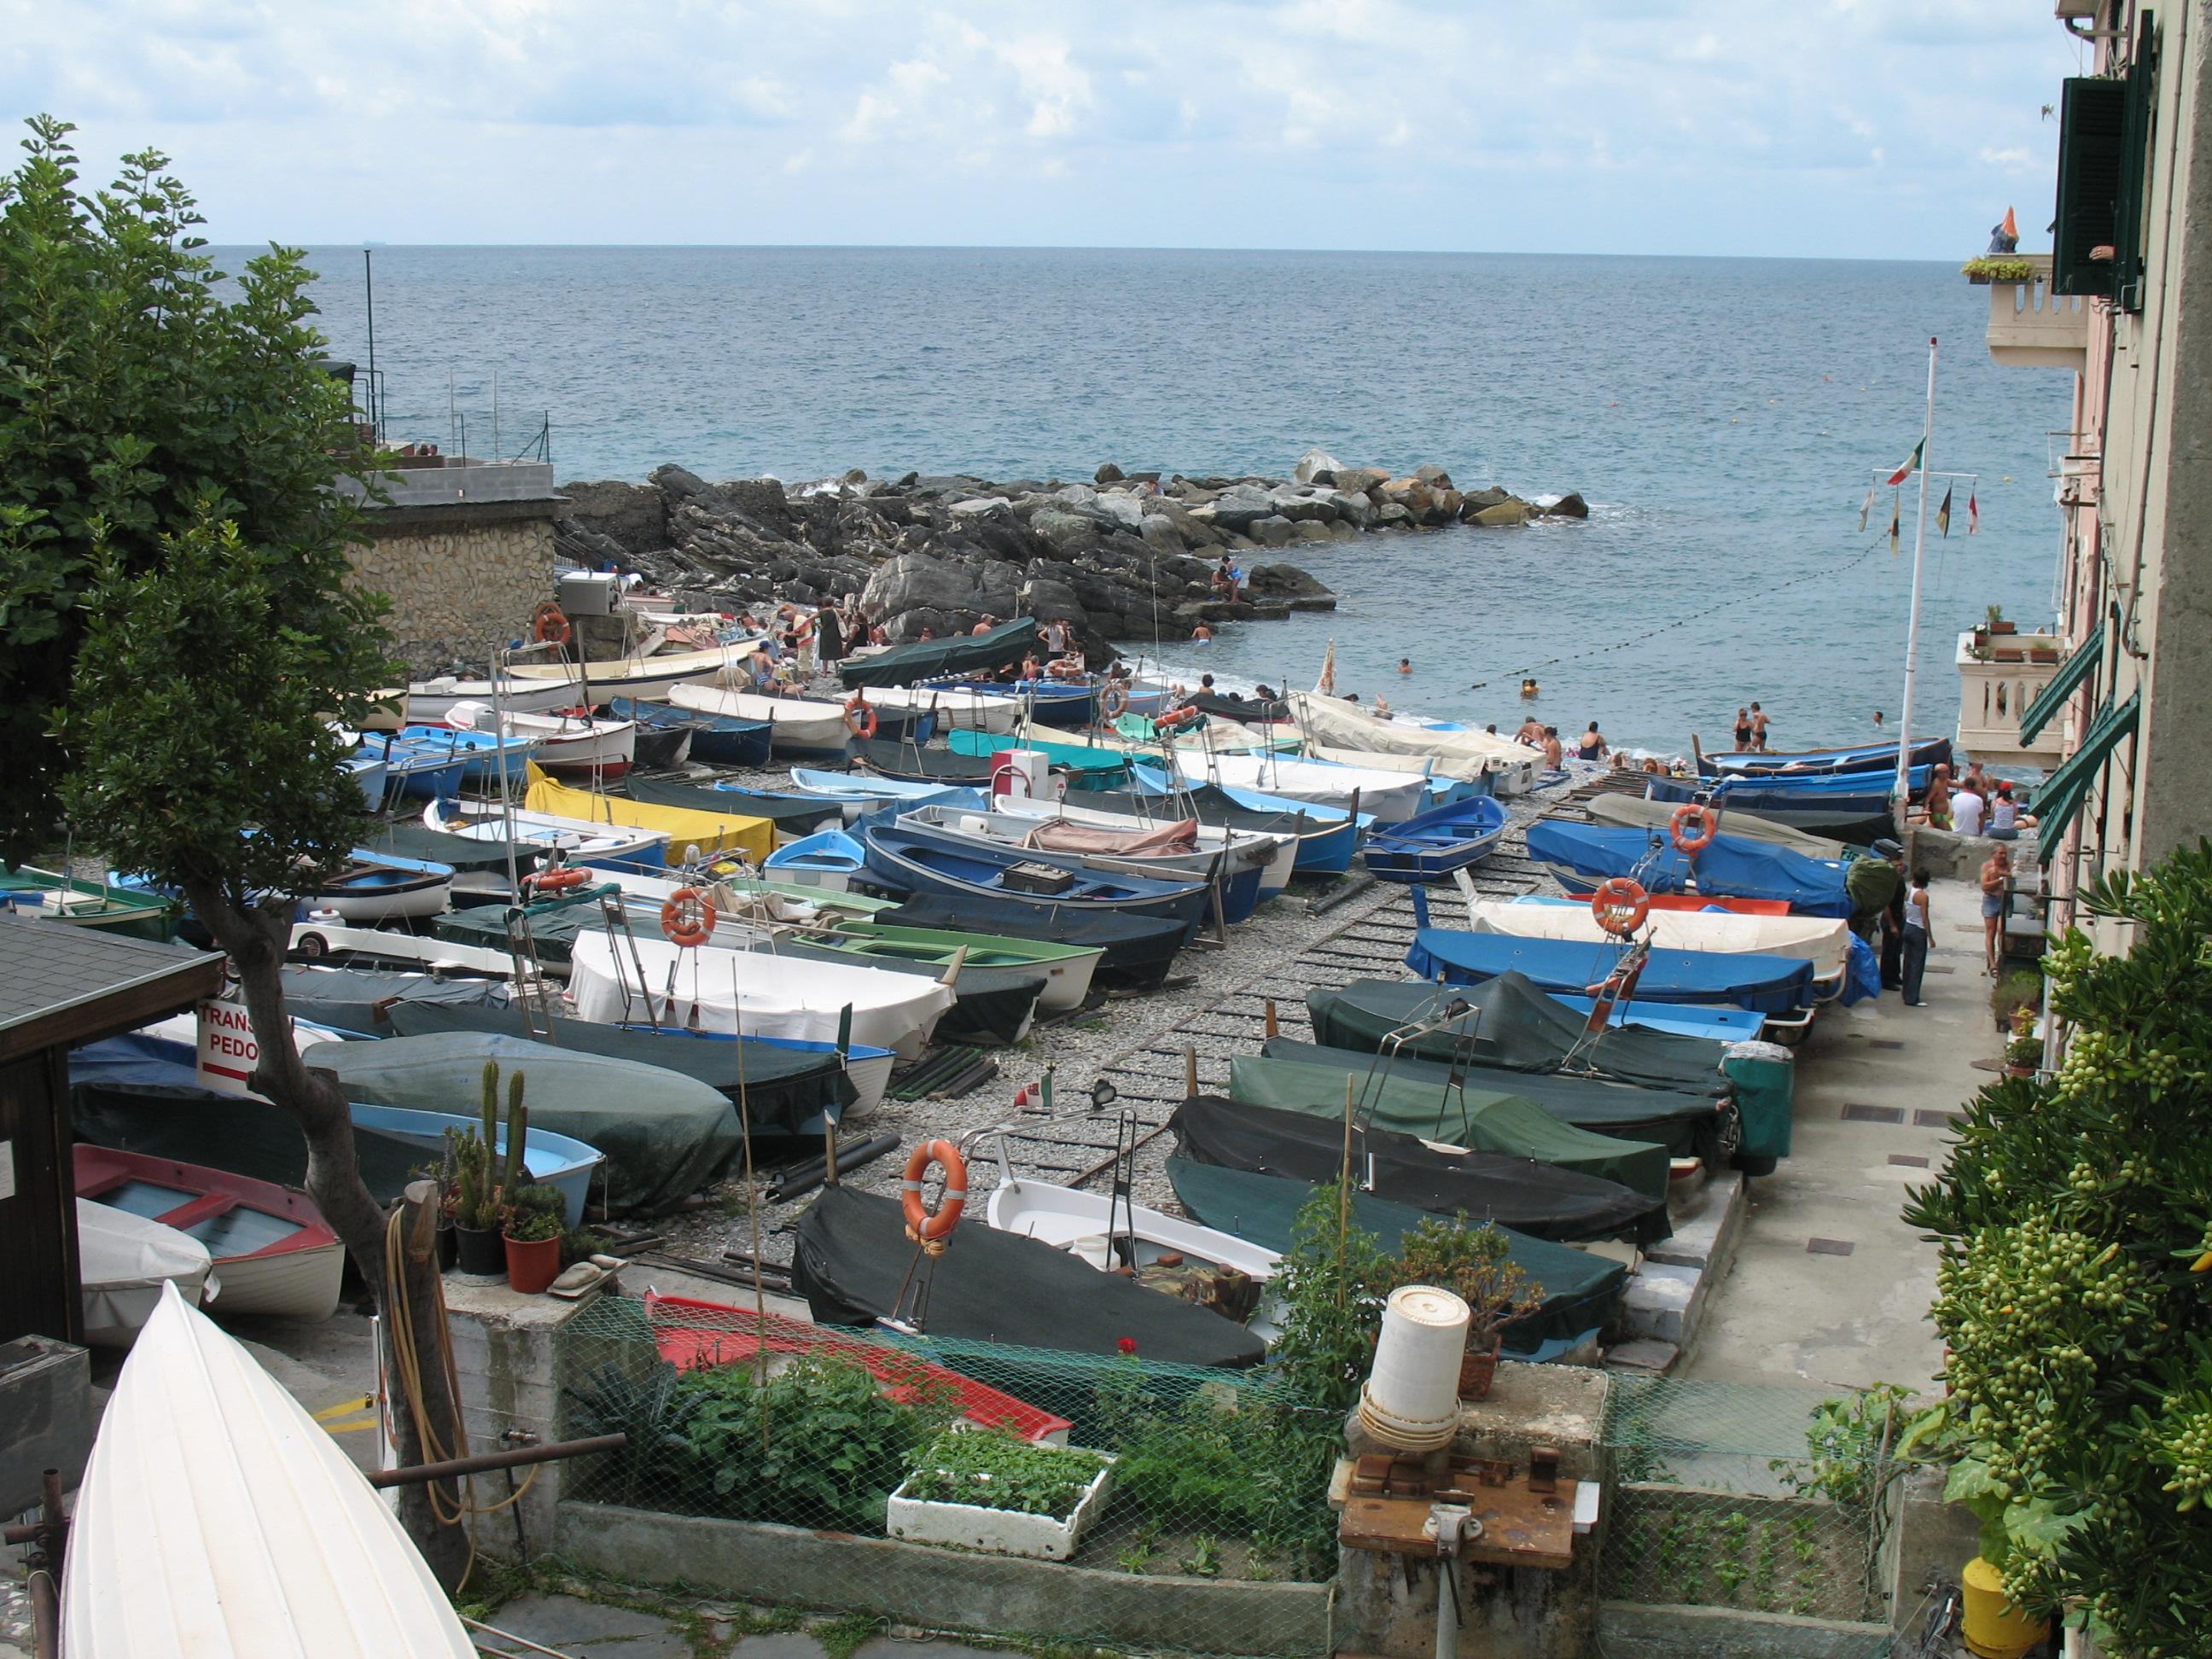 Noleggio Barche Genova - Navalia | Noleggia un Sogno